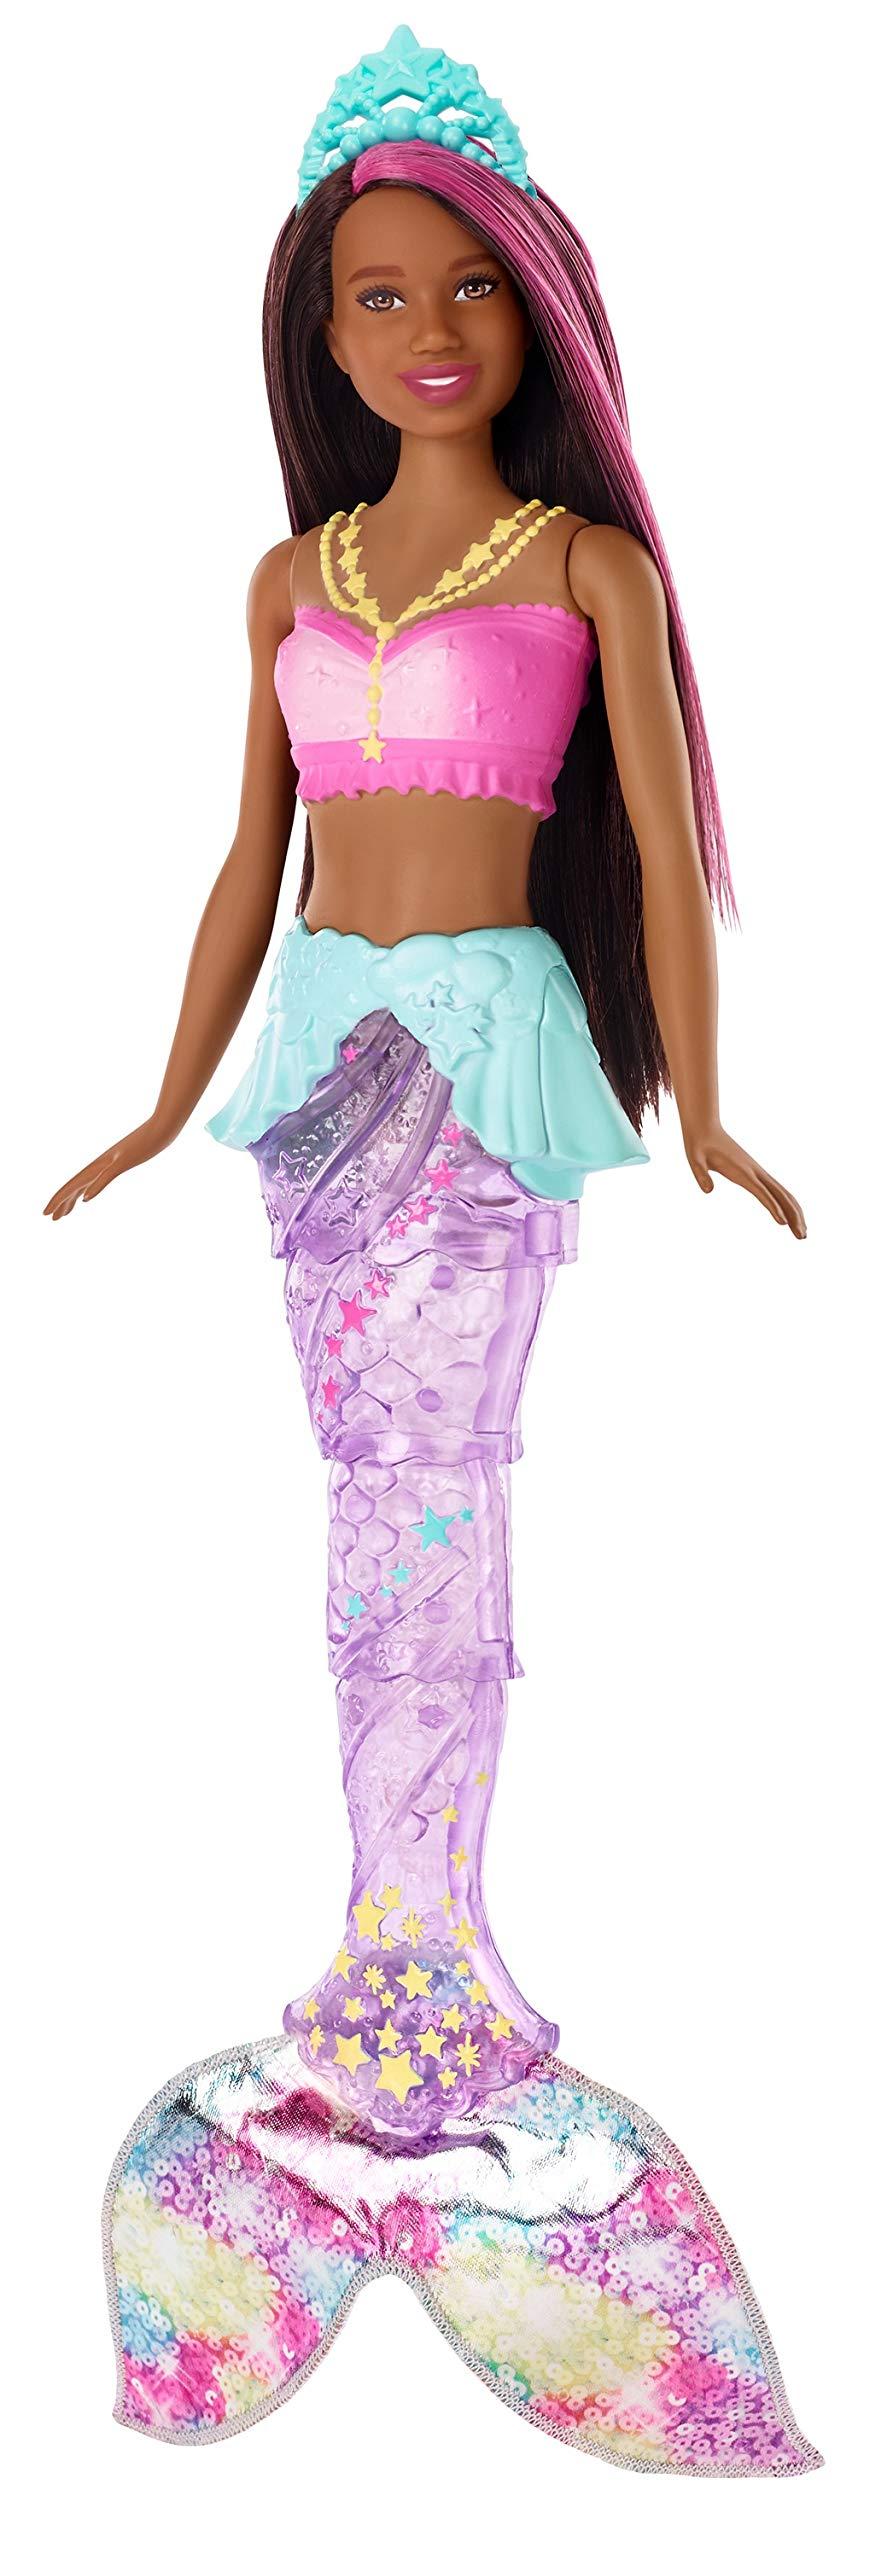 Barbie Dreamtopia Sparkle Lights Mermaid, Brunette